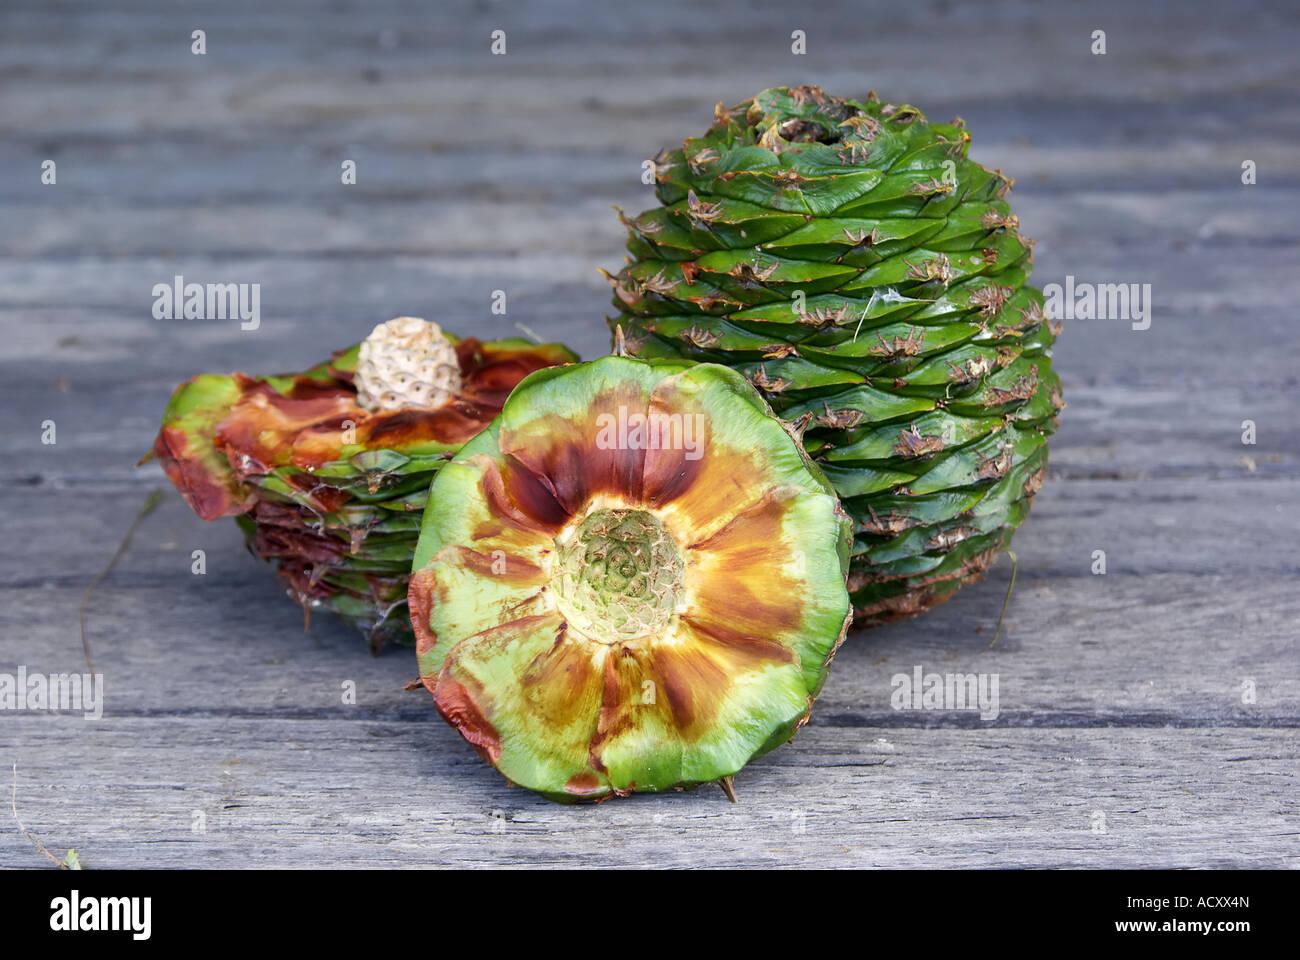 australian bush tucker bunya nut Araucaria bidwillii one chopped showing inside and one whole Stock Photo